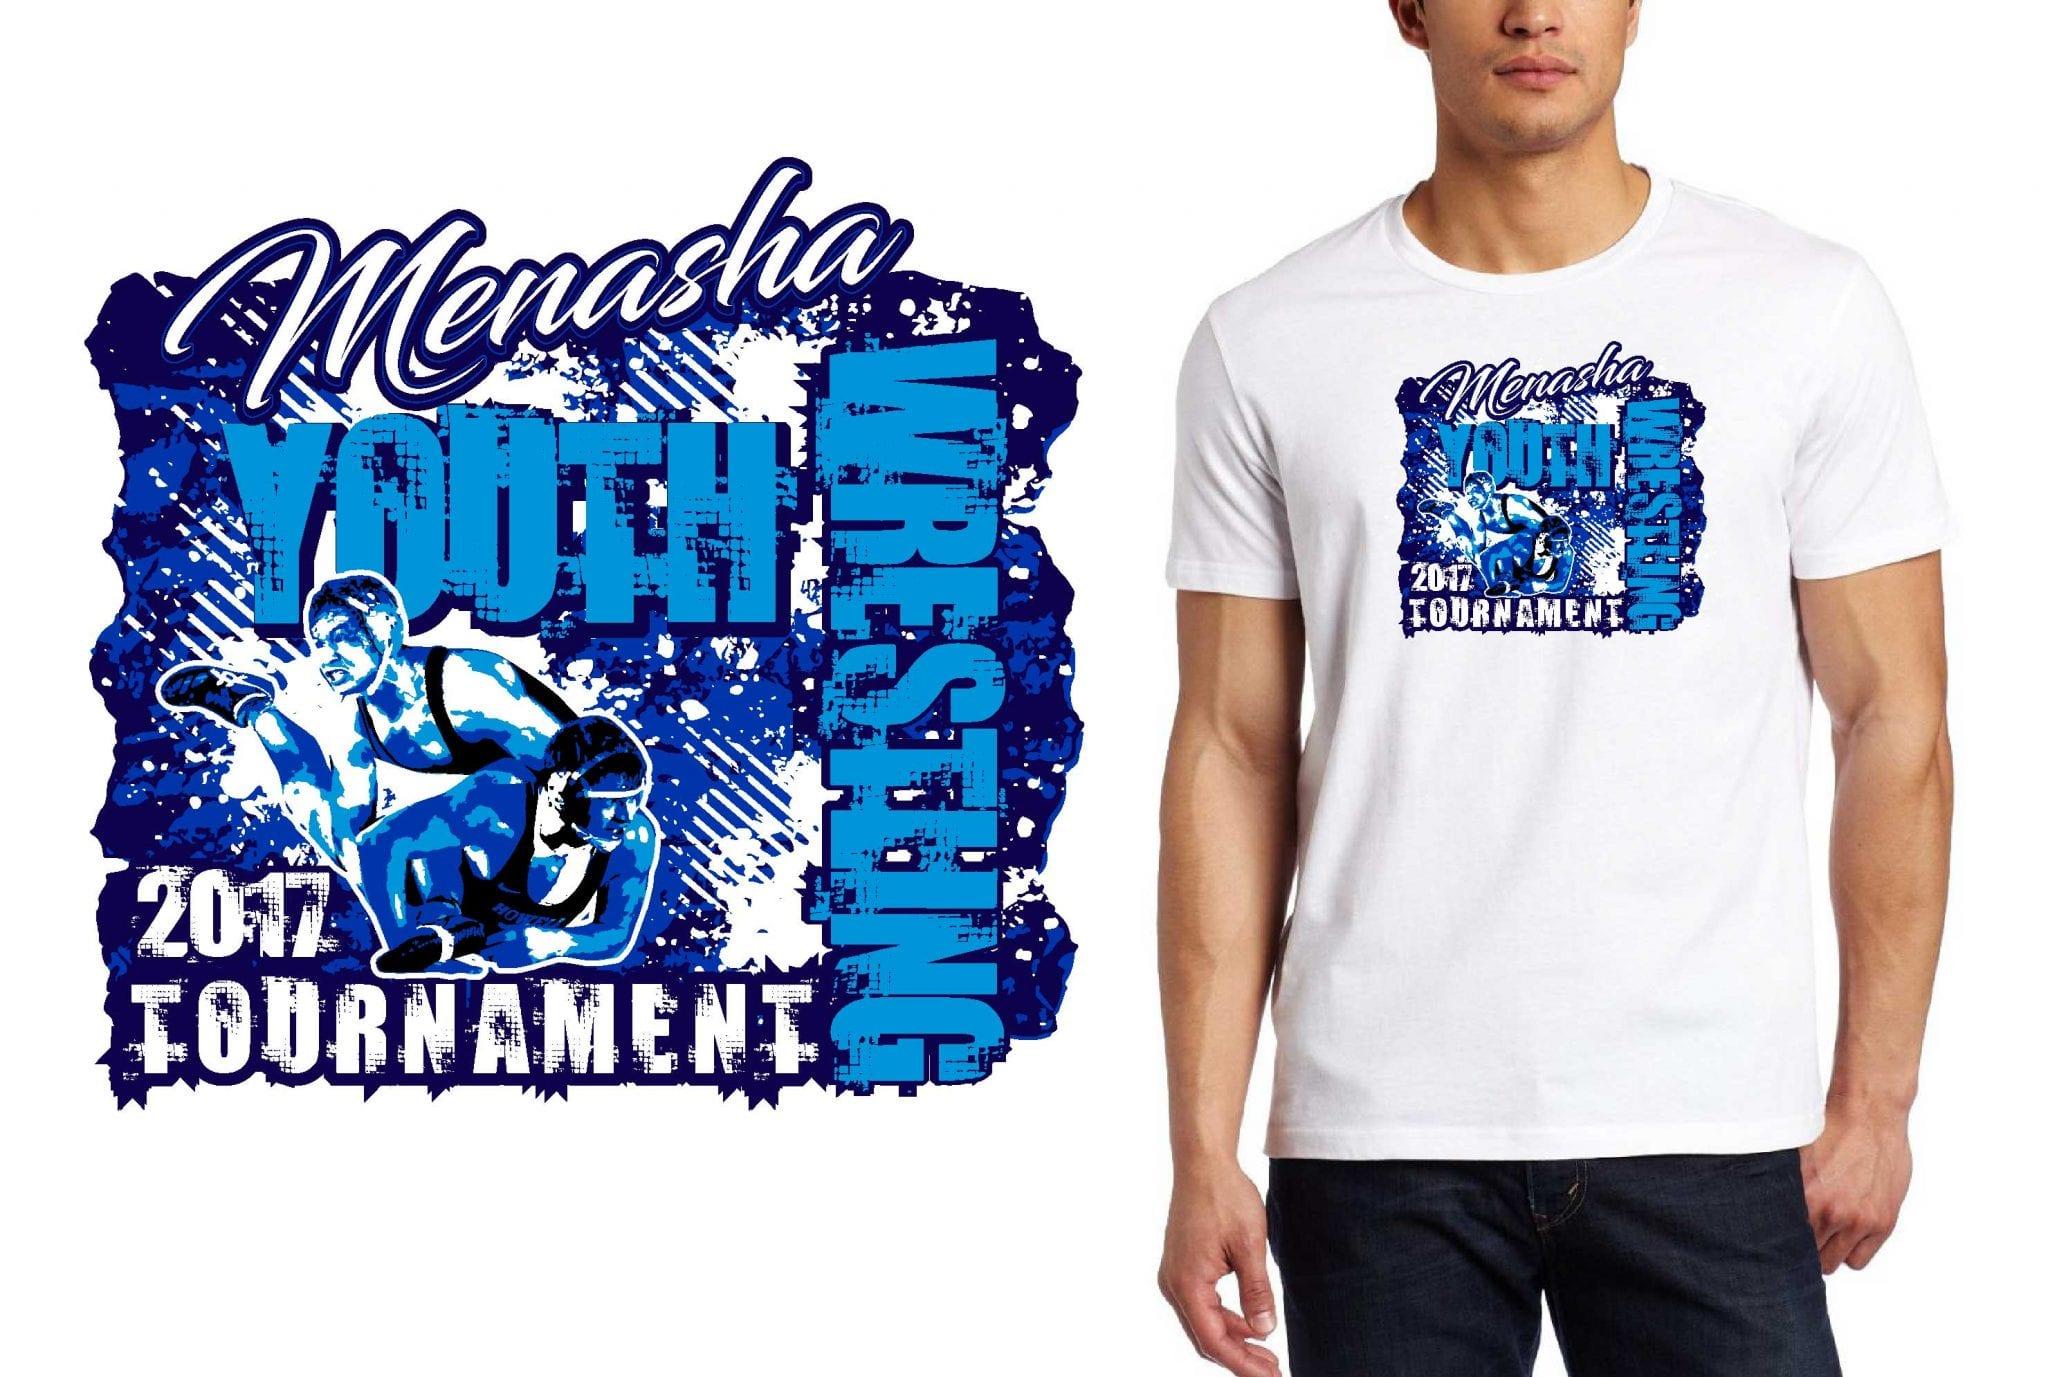 WRESTLING LOGO for Menasha-Youth-Wrestling-Tournament T-SHIRT UrArtStudio